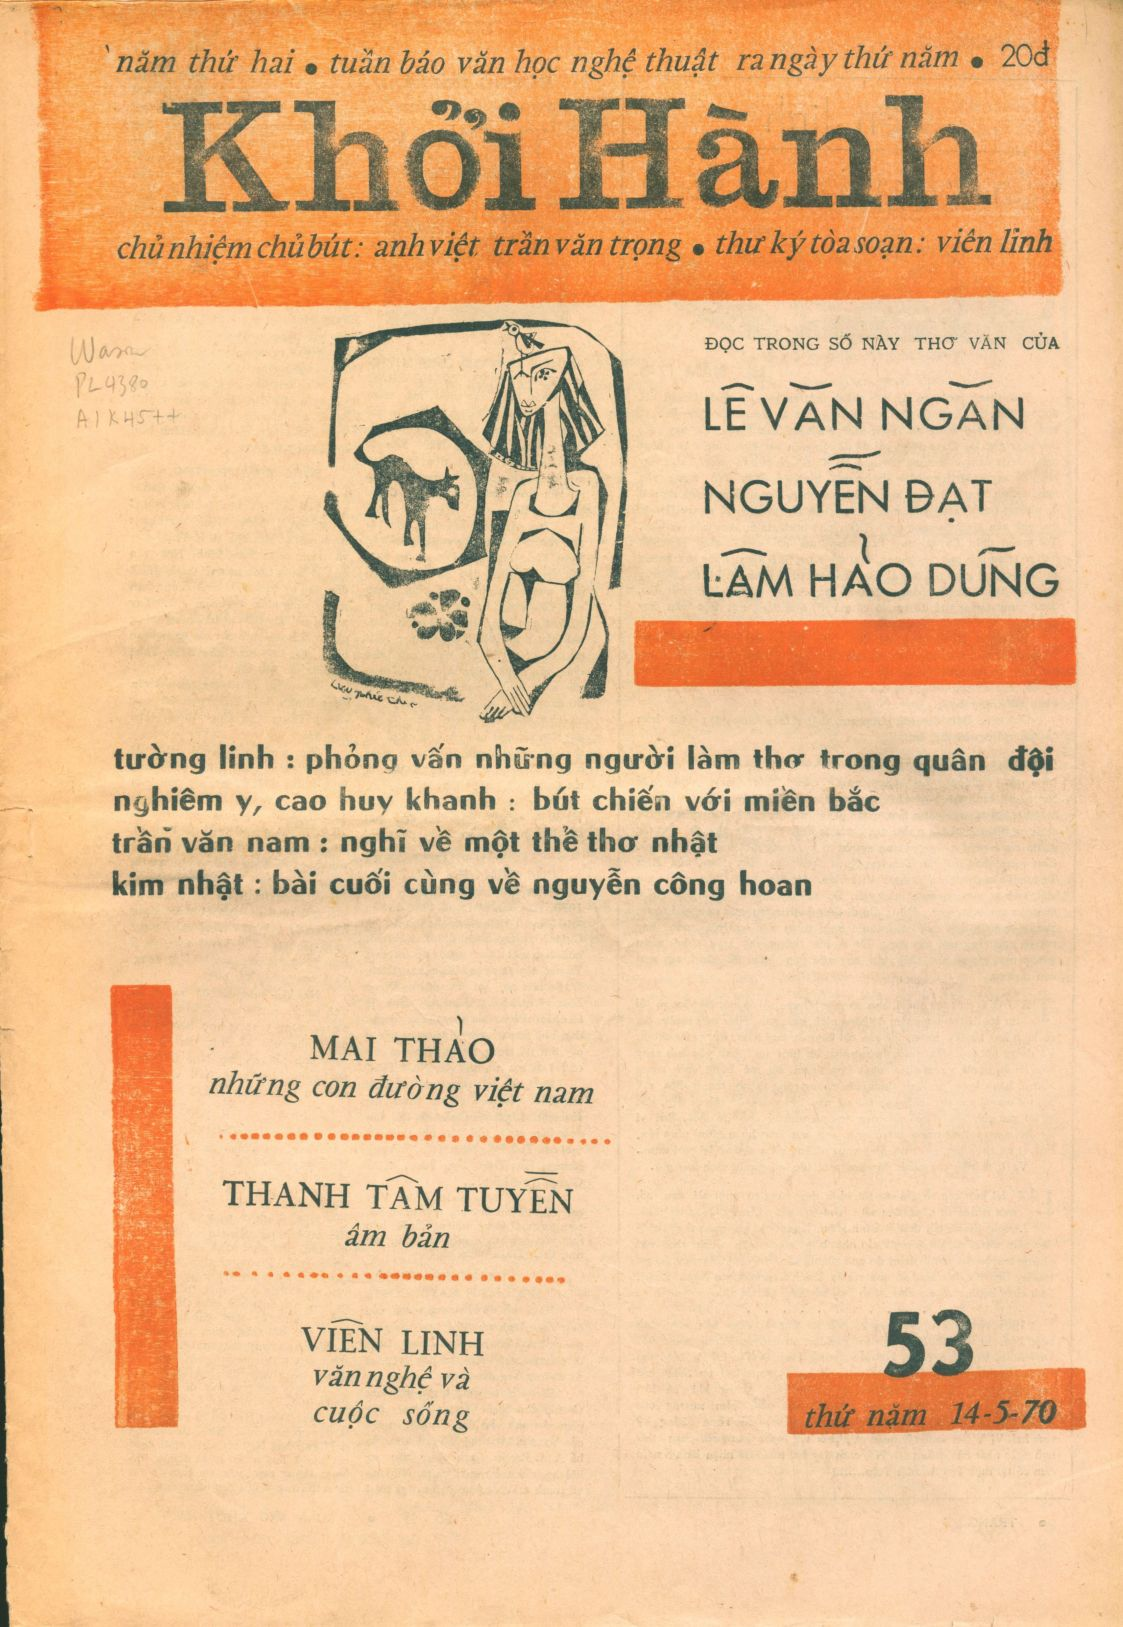 bia 53